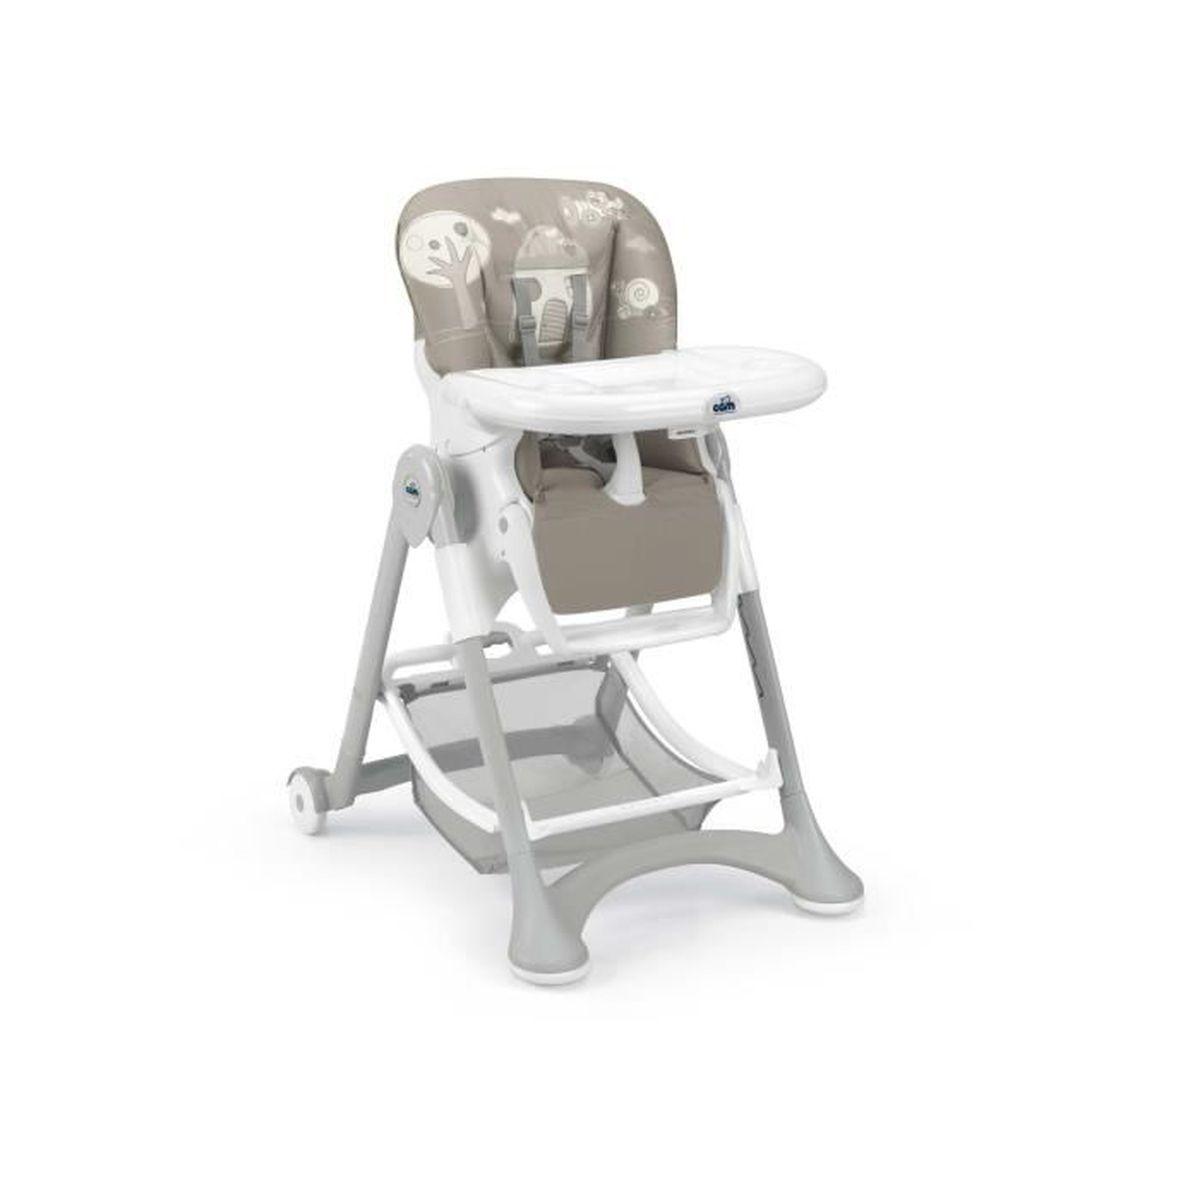 A quel age bebe va dans la chaise haute for Chaise haute x adventure